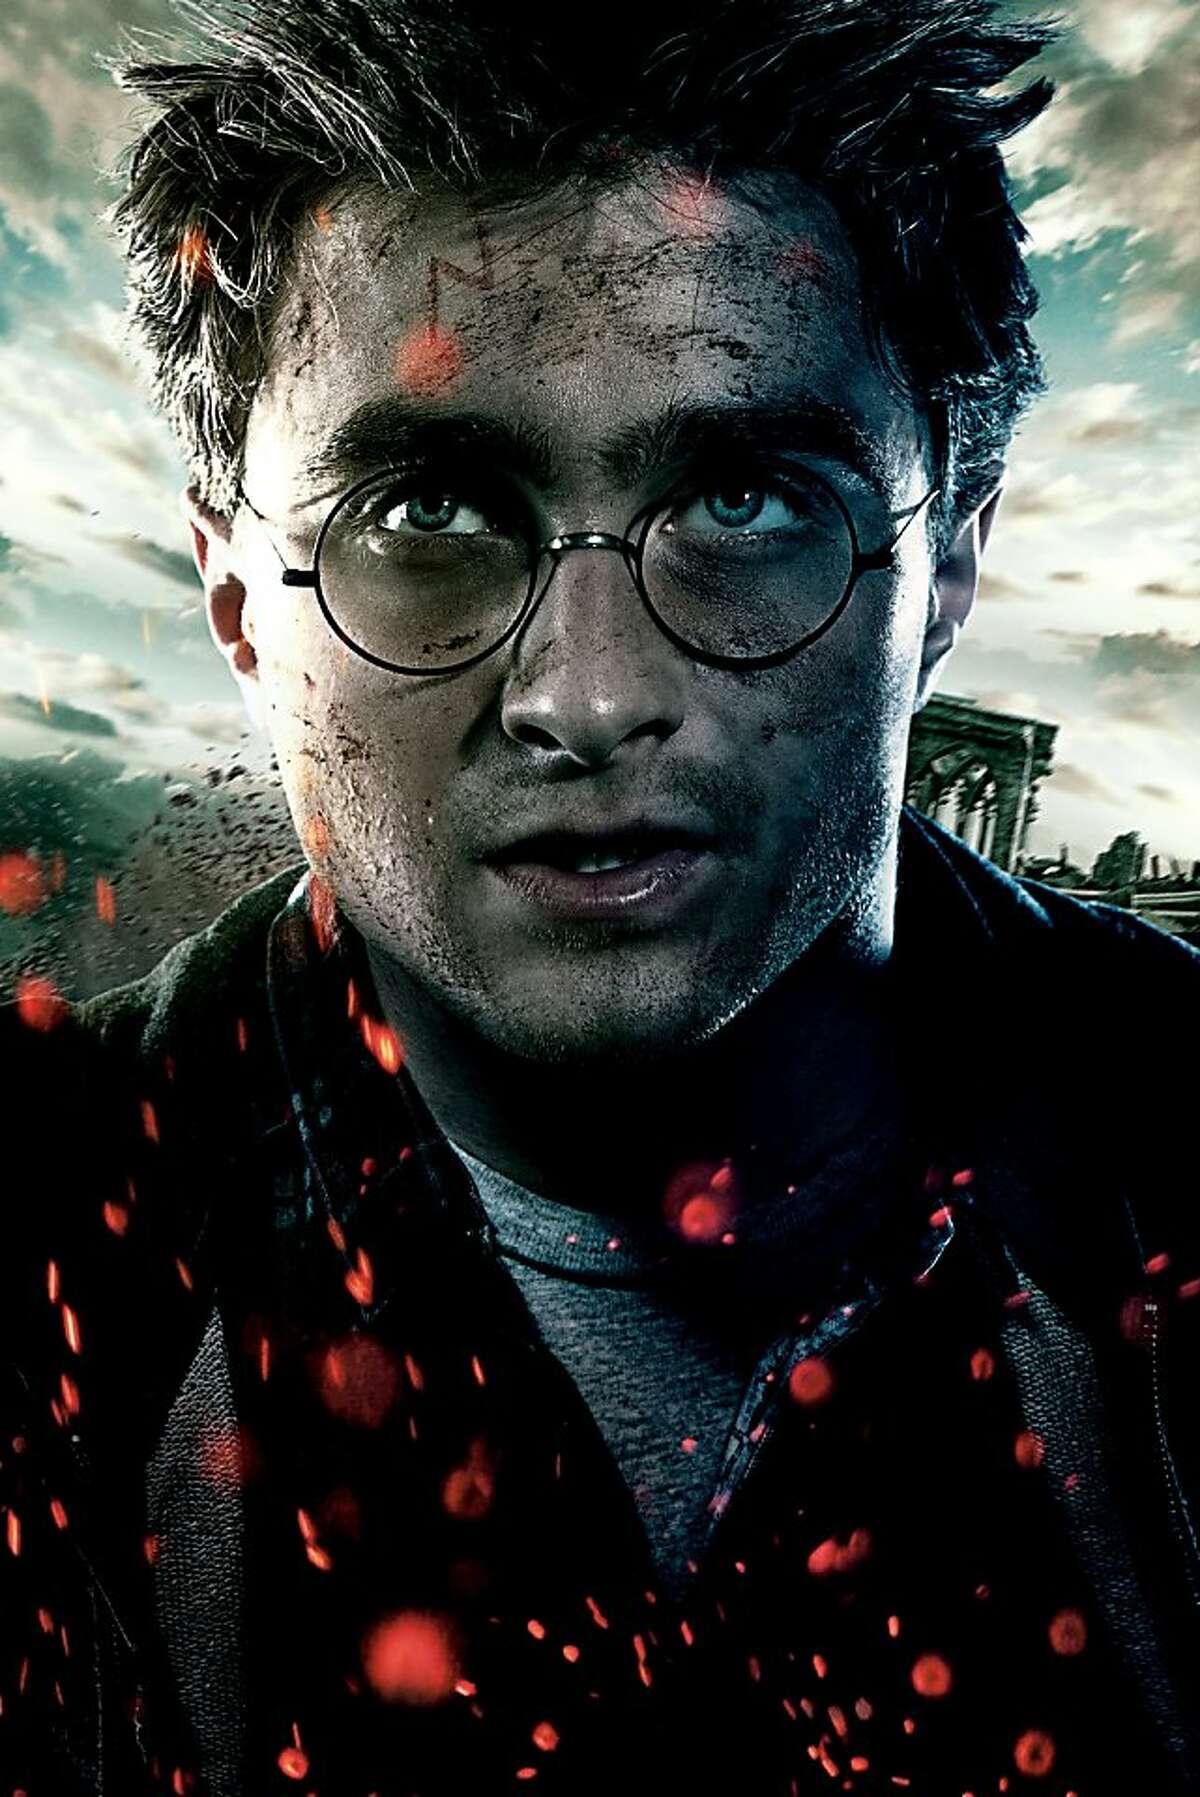 DANIEL RADCLIFFE as Harry Potter in Warner Bros. Pictures fantasy adventure.